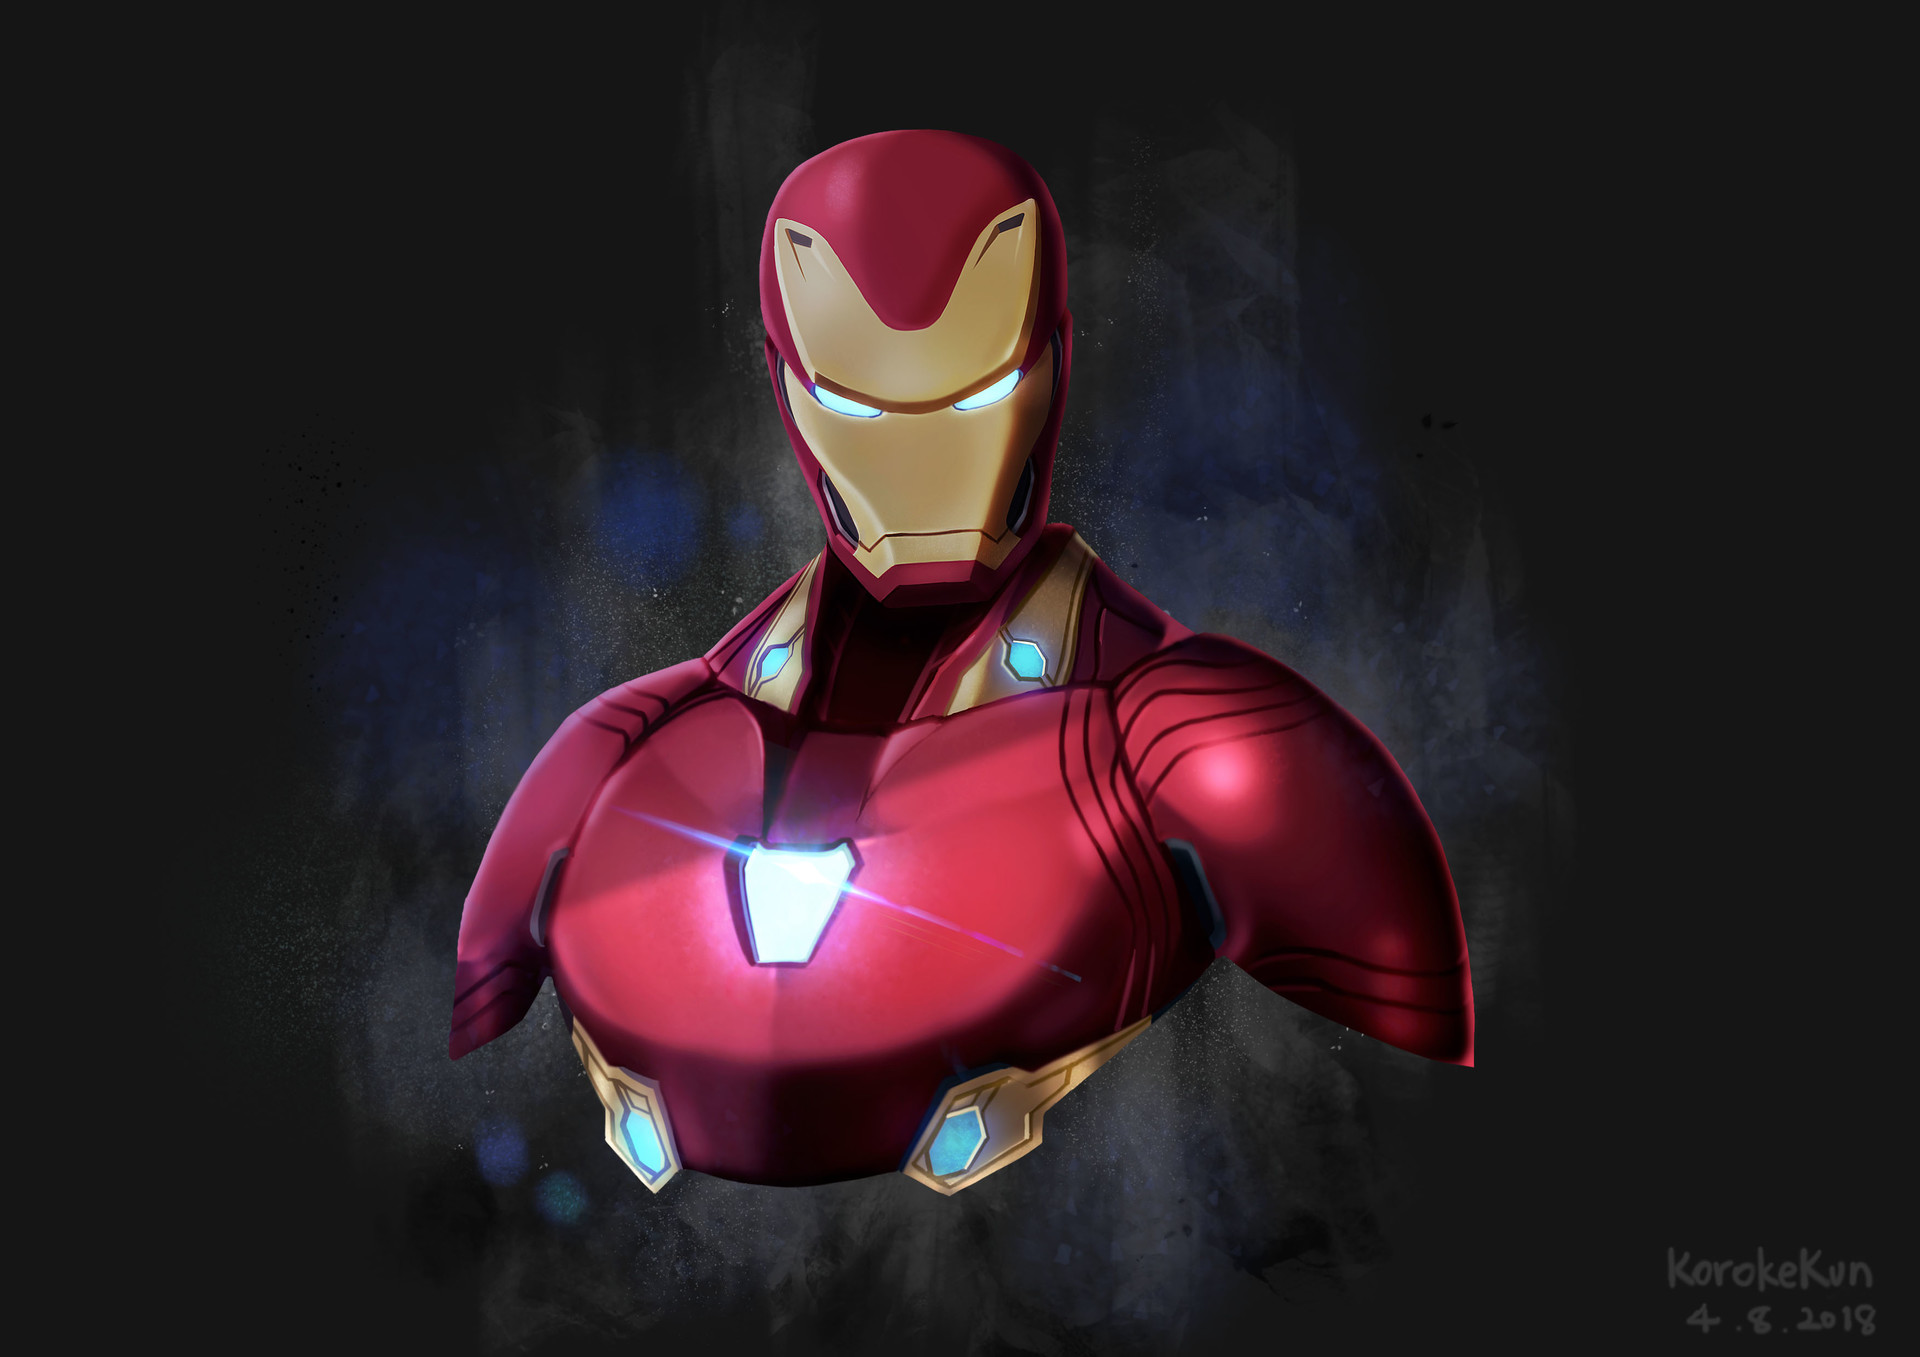 1920x1080 iron man avengers infinity war artwork laptop - Iron man cartoon hd ...